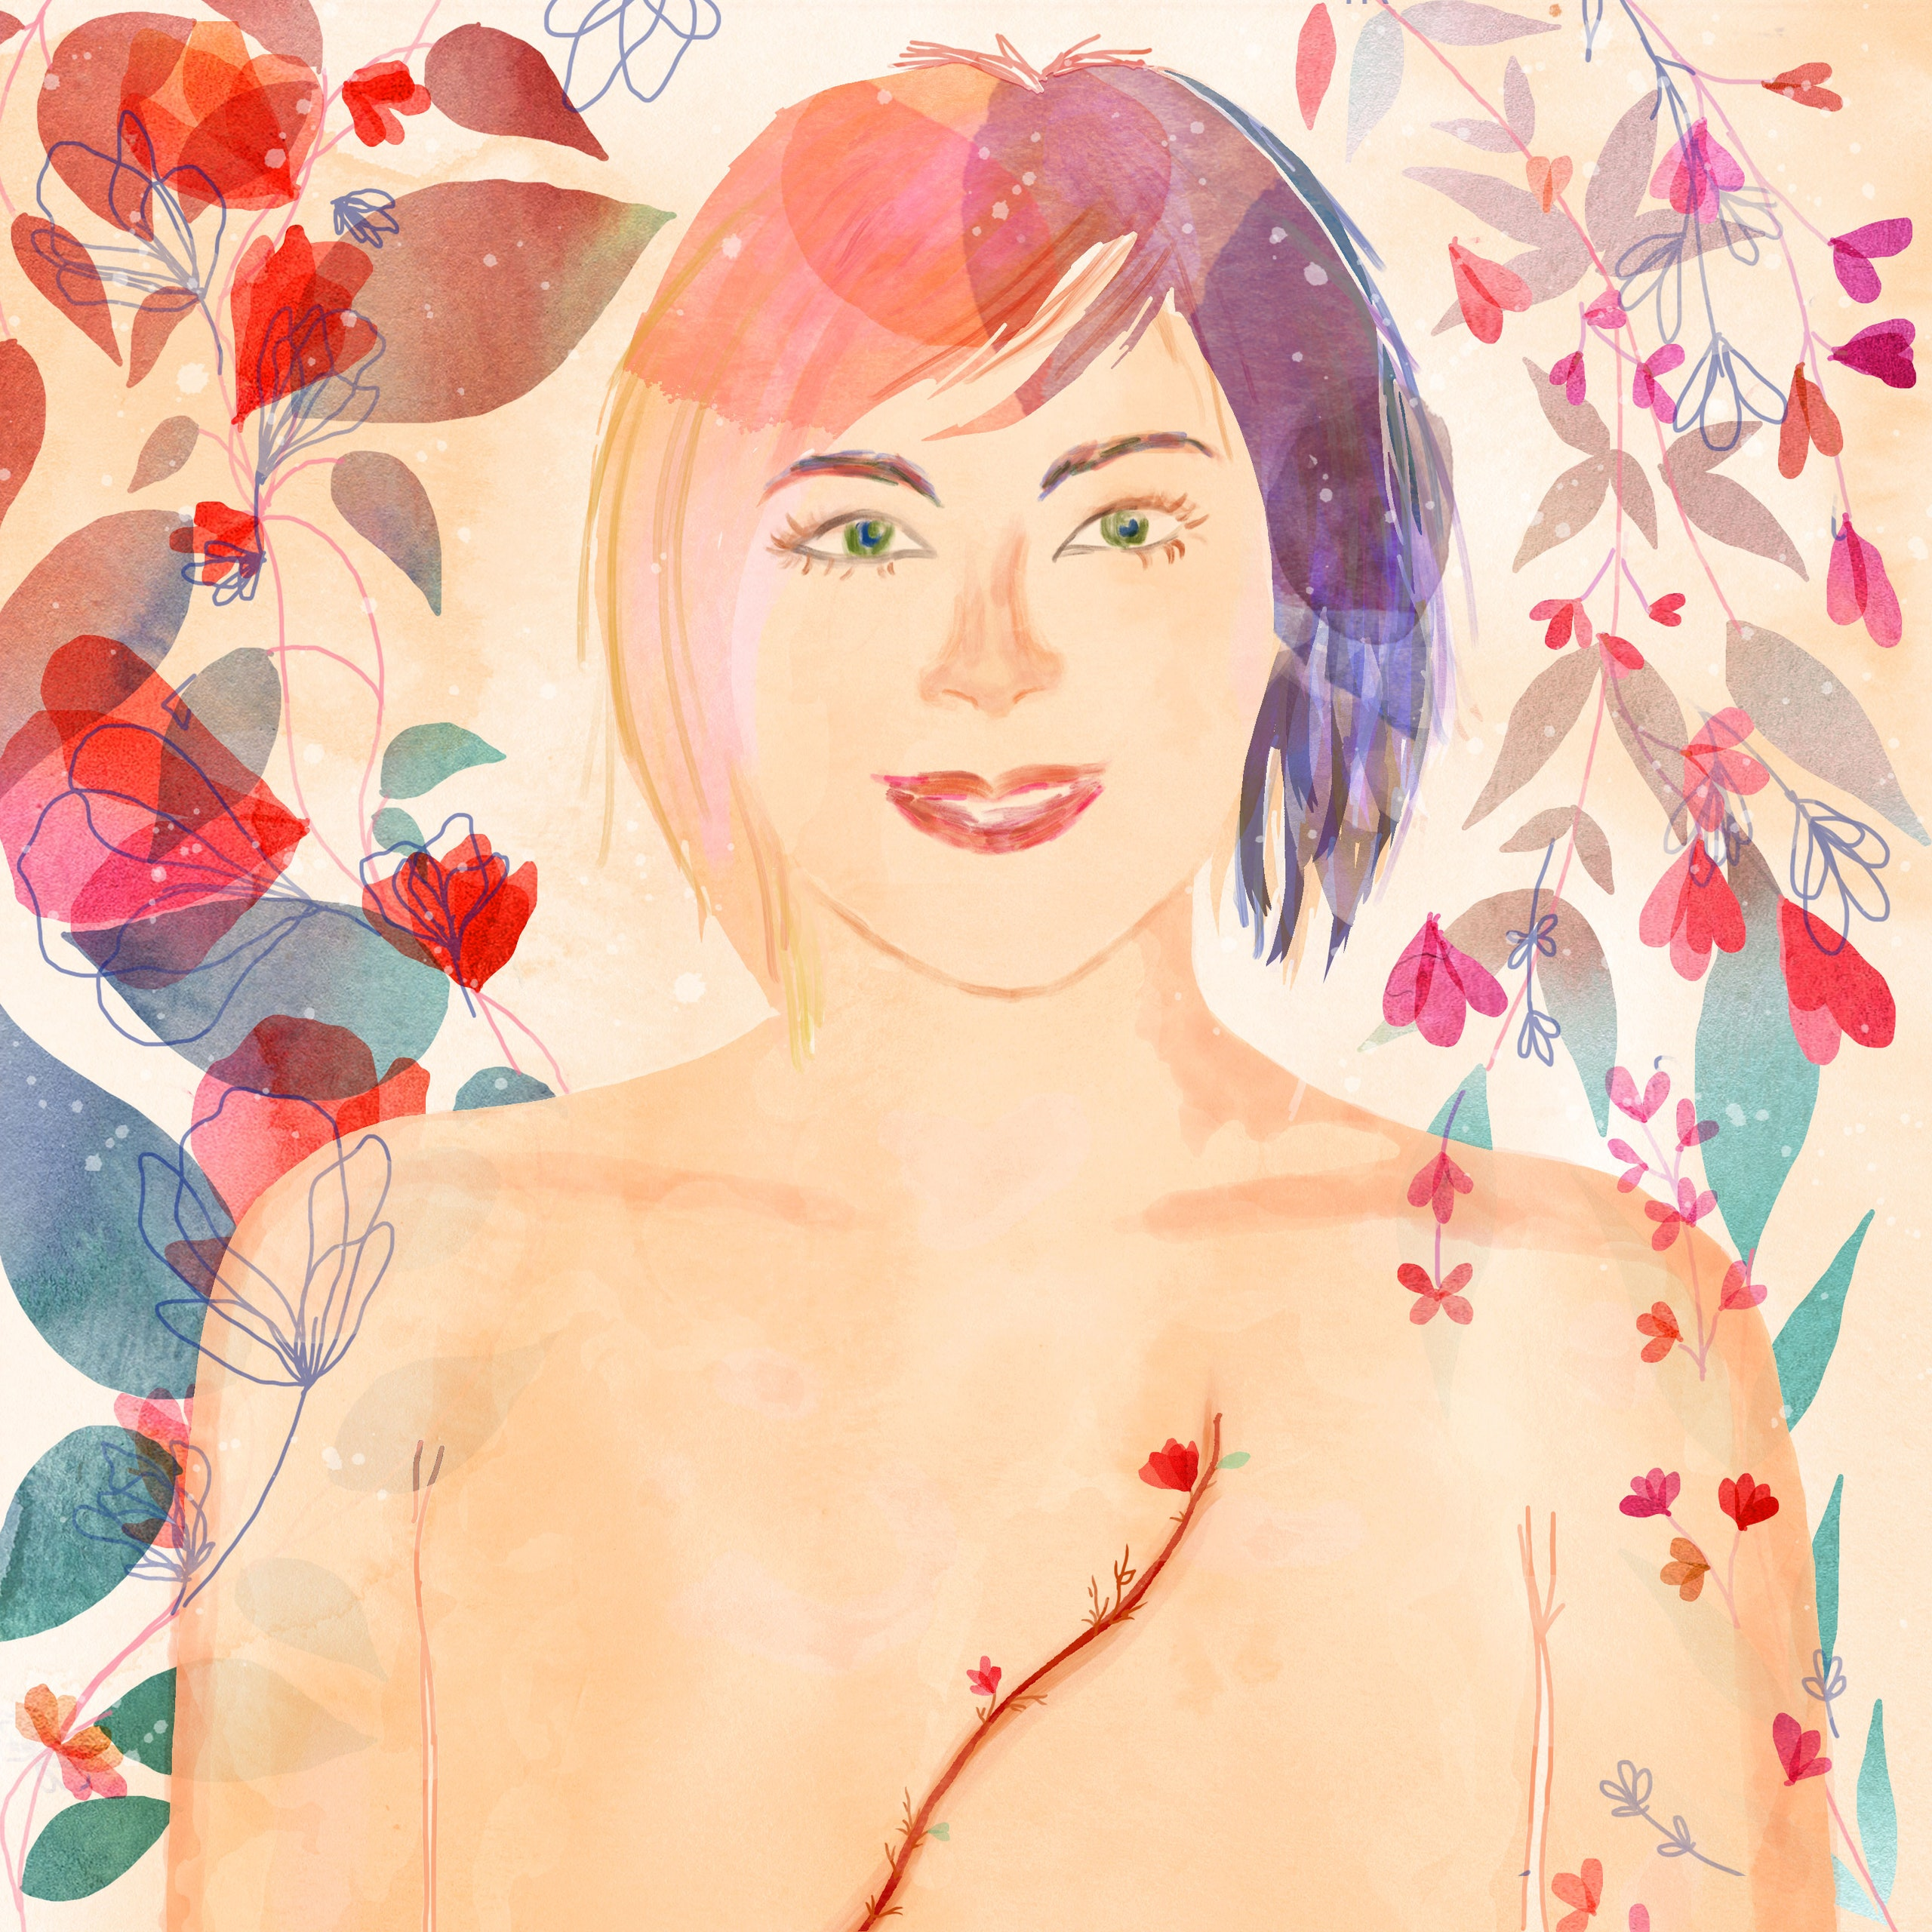 Krysta Rodriguez on Womanhood After Breast Cancer